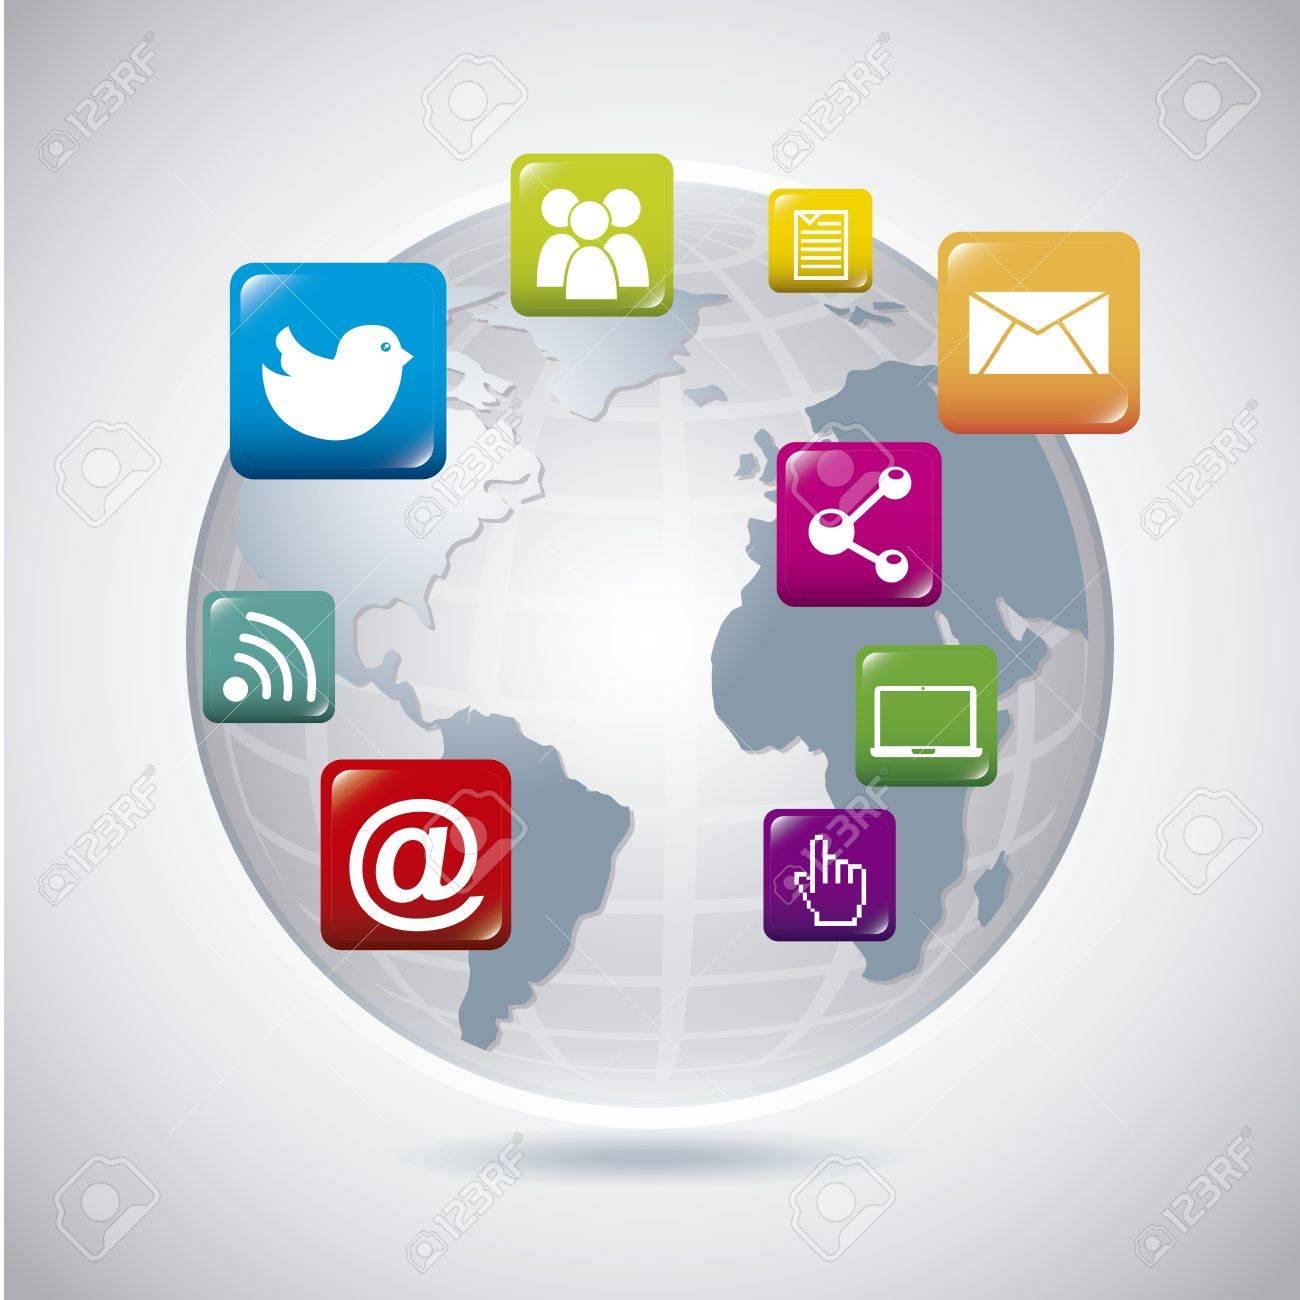 world social network over gray background vector illustration Stock Vector - 19980579